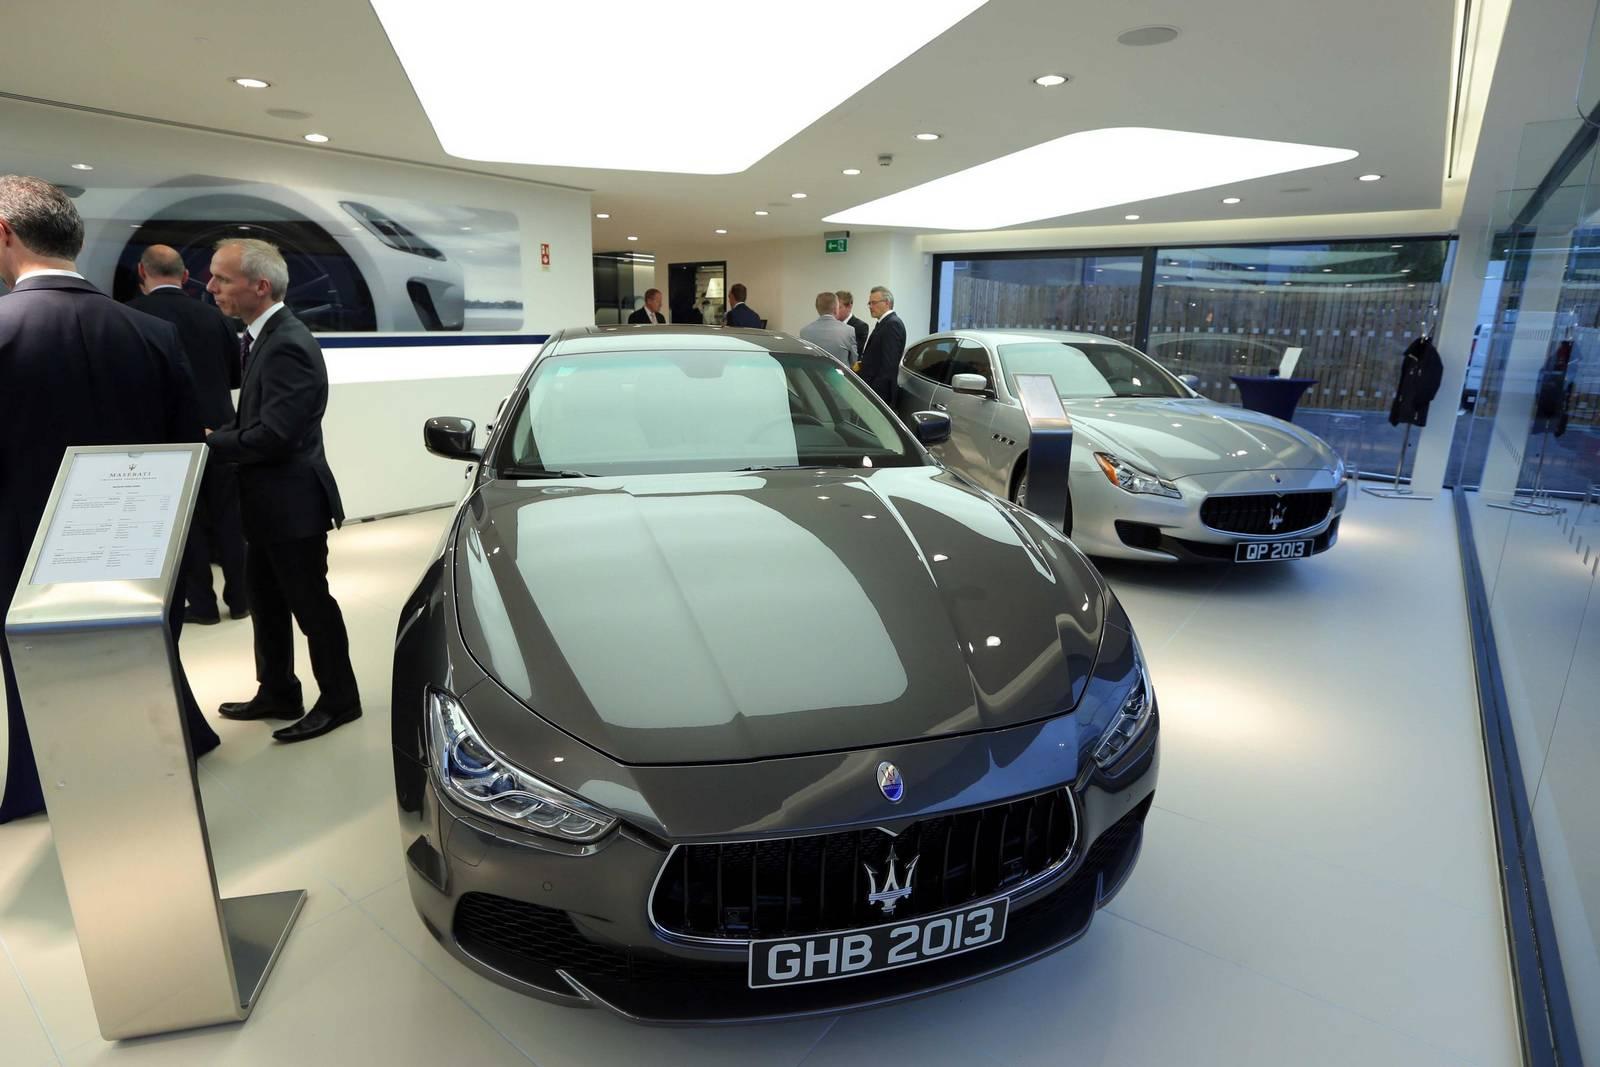 Maserati Cars For Sale In Ireland